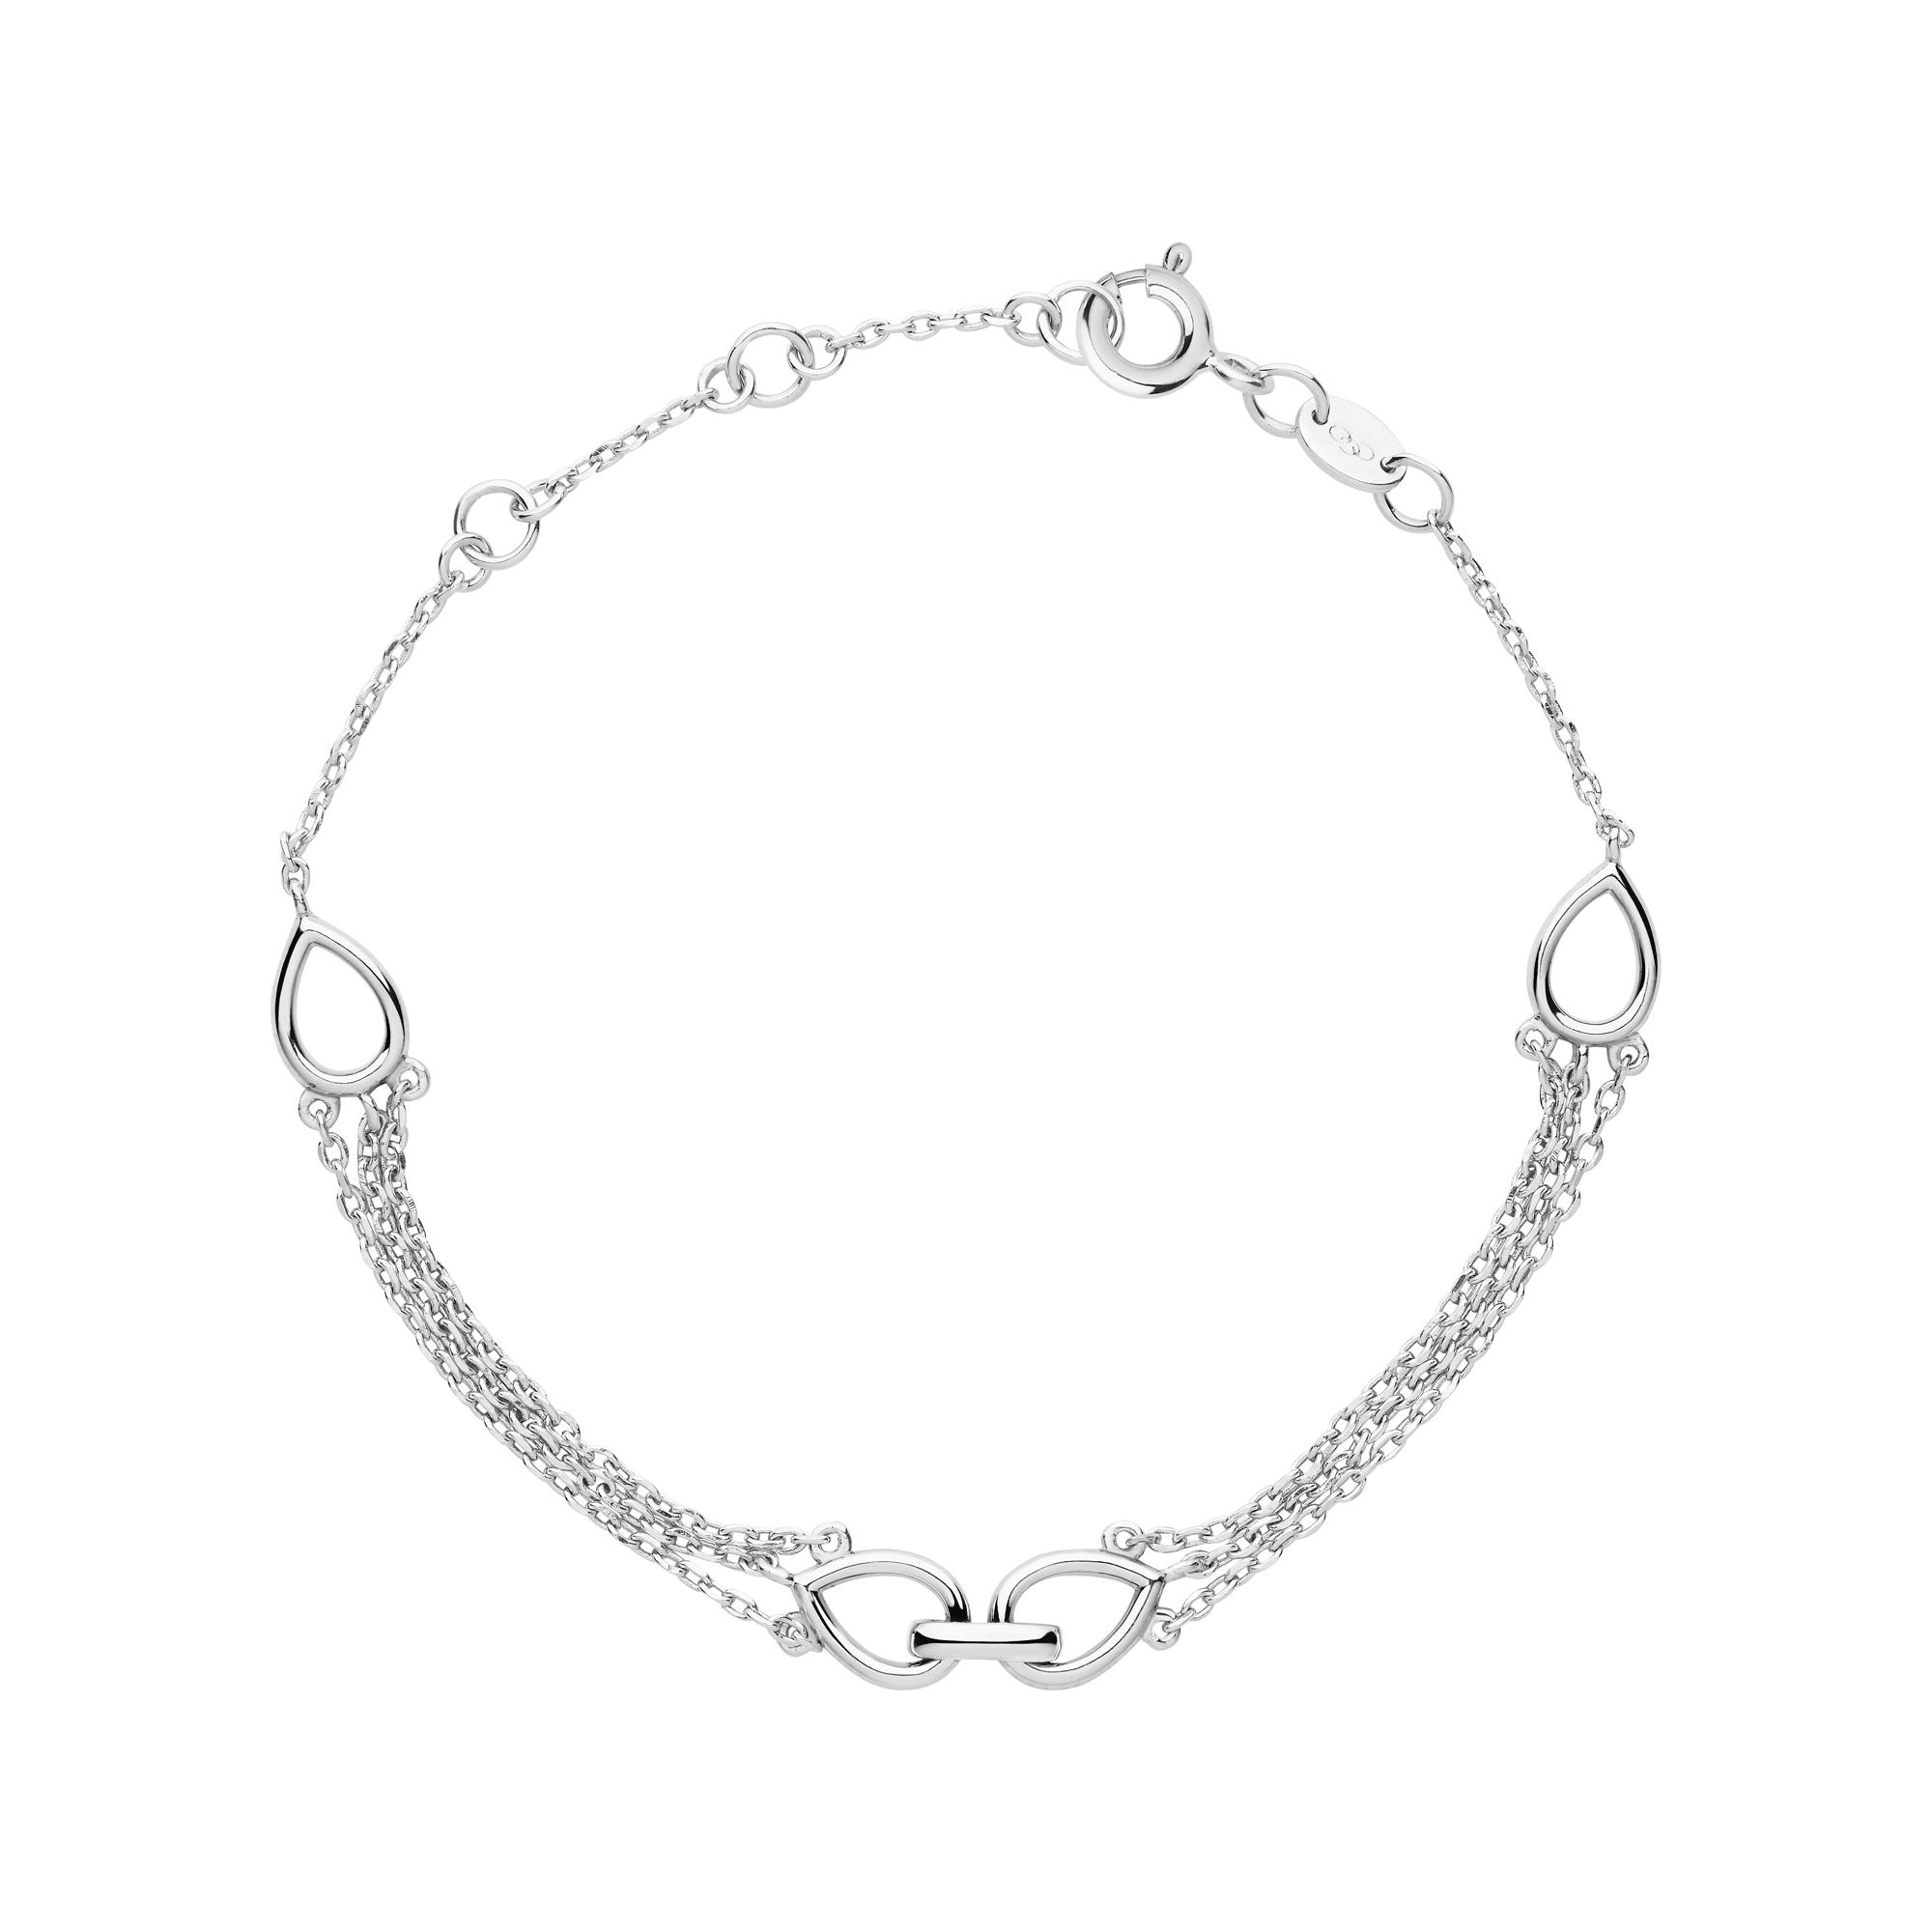 LINKS OF LONDON - Ασημένιο βραχιόλι Outlet Flare Double γυναικεία αξεσουάρ κοσμήματα βραχιόλια